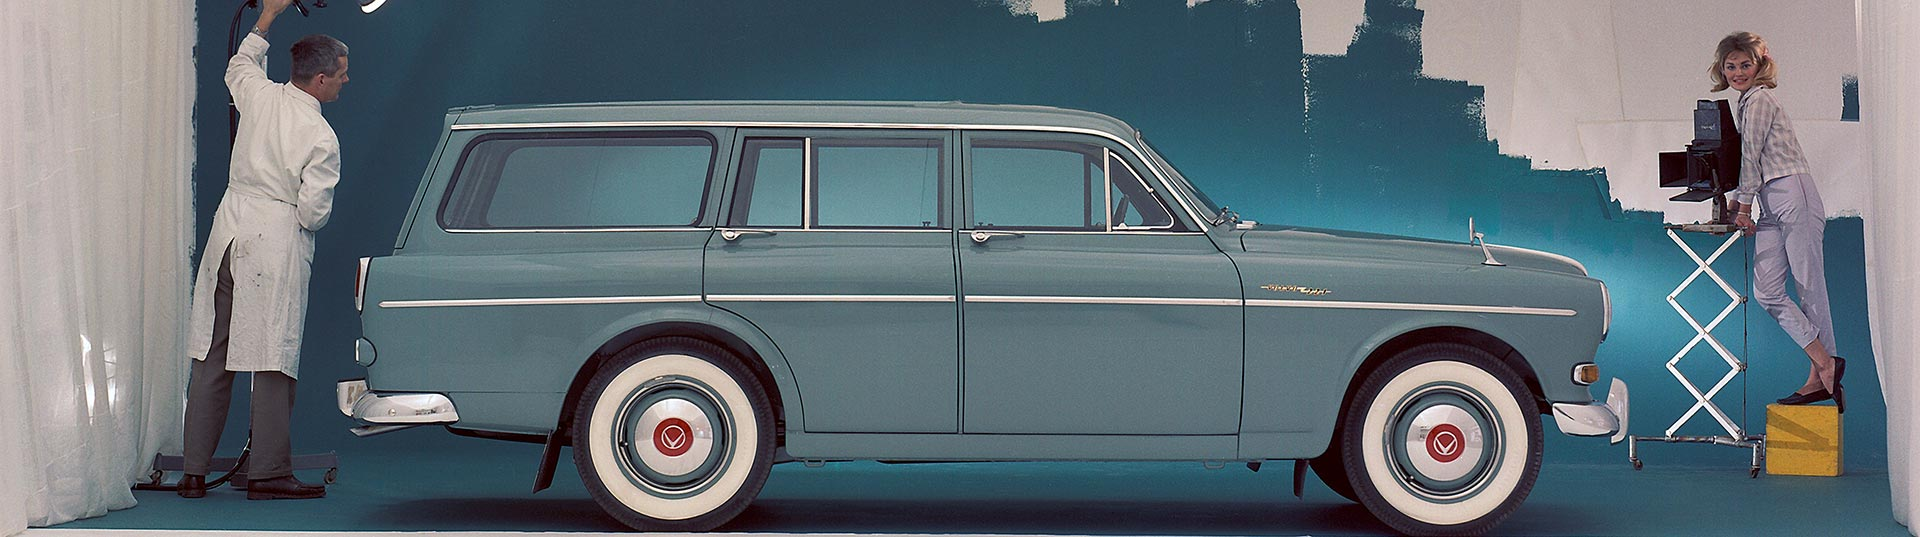 60 anos de Volvo Amazon